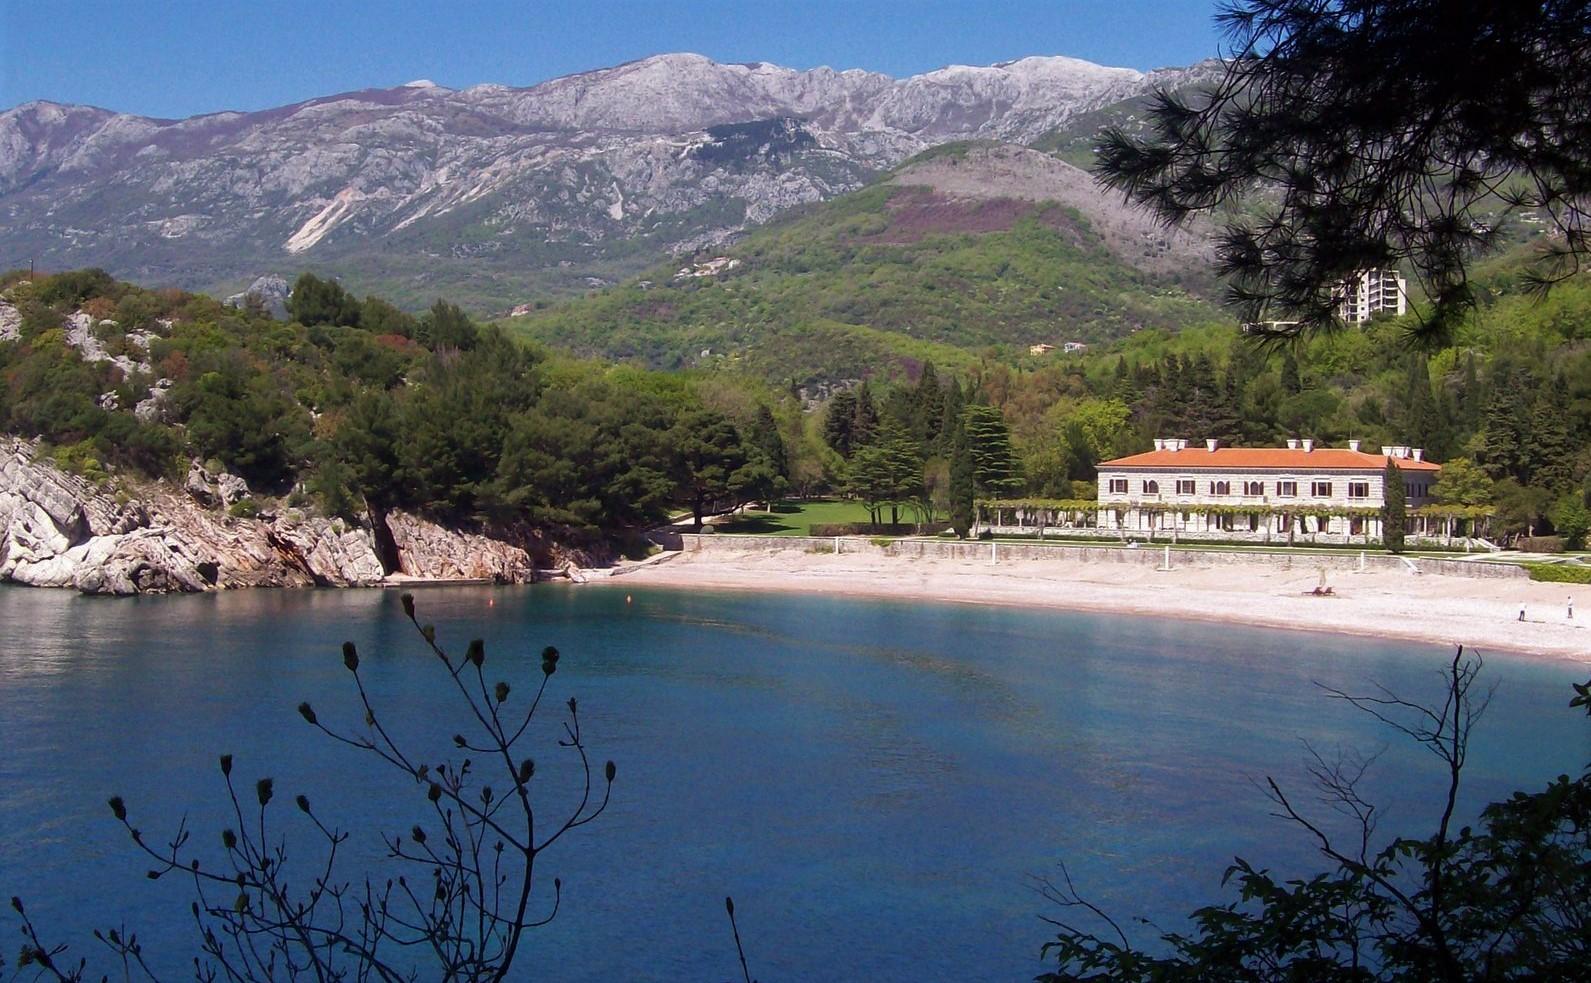 Sommerresidenz der jugoslawischen Königin Marija Karadjordjevic - Montenegro